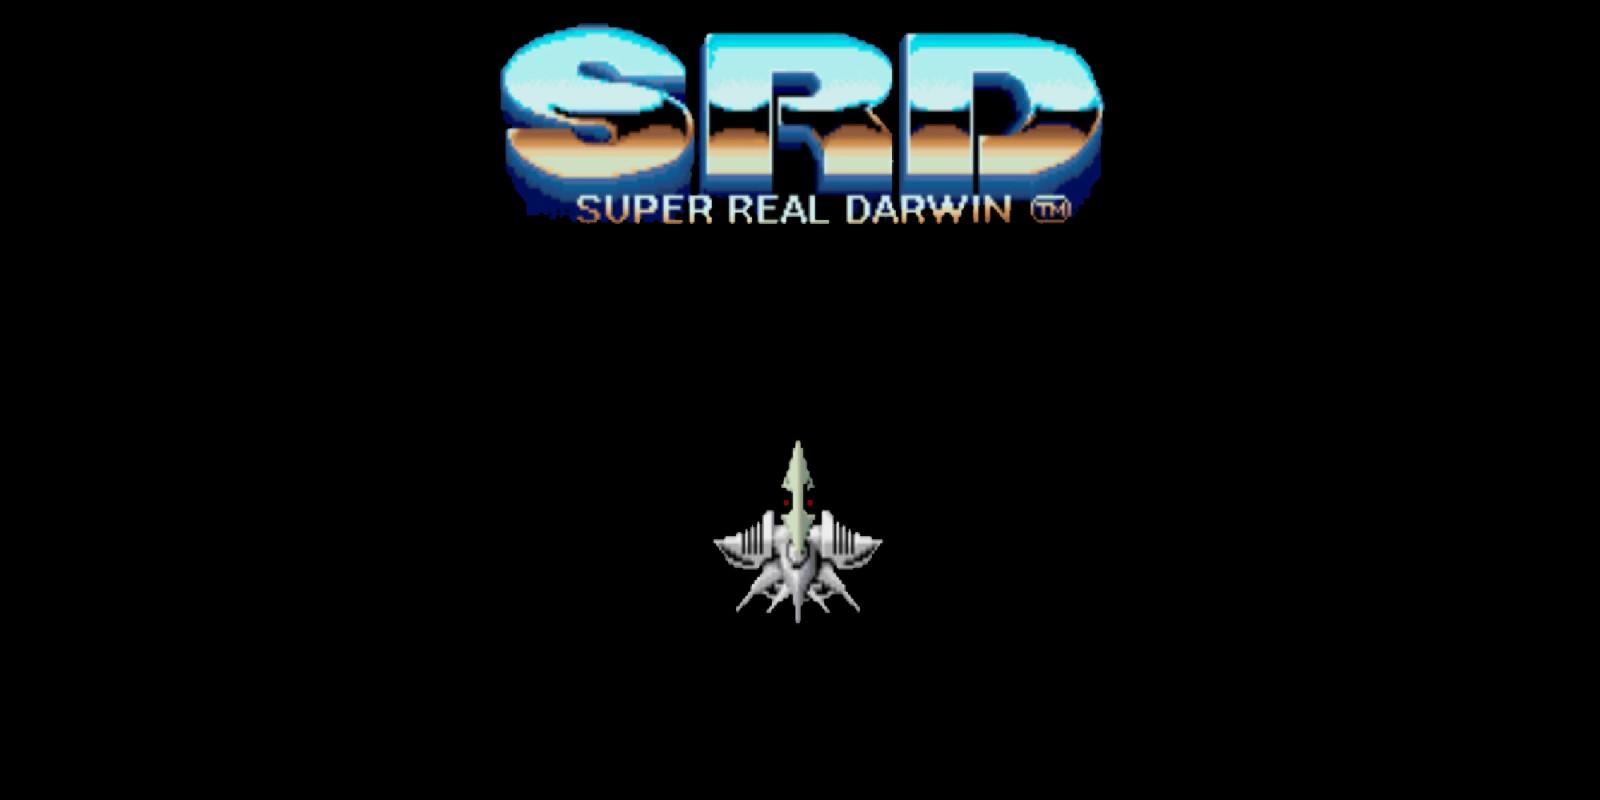 Arcade game SDR: Super Real Darwin hitting the Switch eShop tomorrow